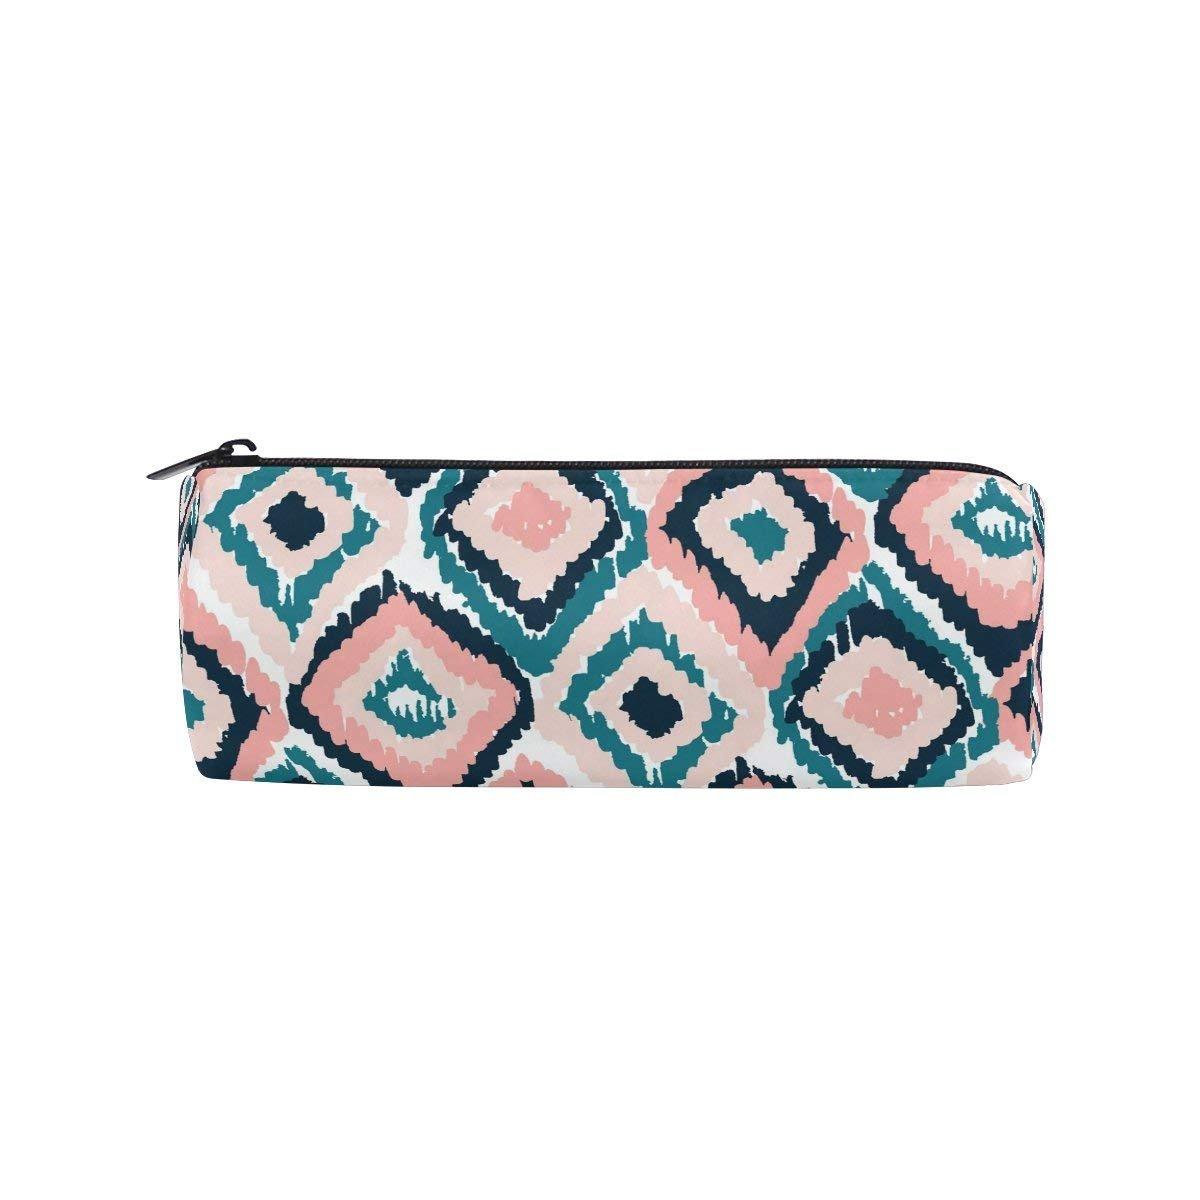 Estuche redondo con patrón de cuadrícula para lápices, bolsa de papelería, bolsa con cremallera, soporte para lápices: Amazon.es: Oficina y papelería